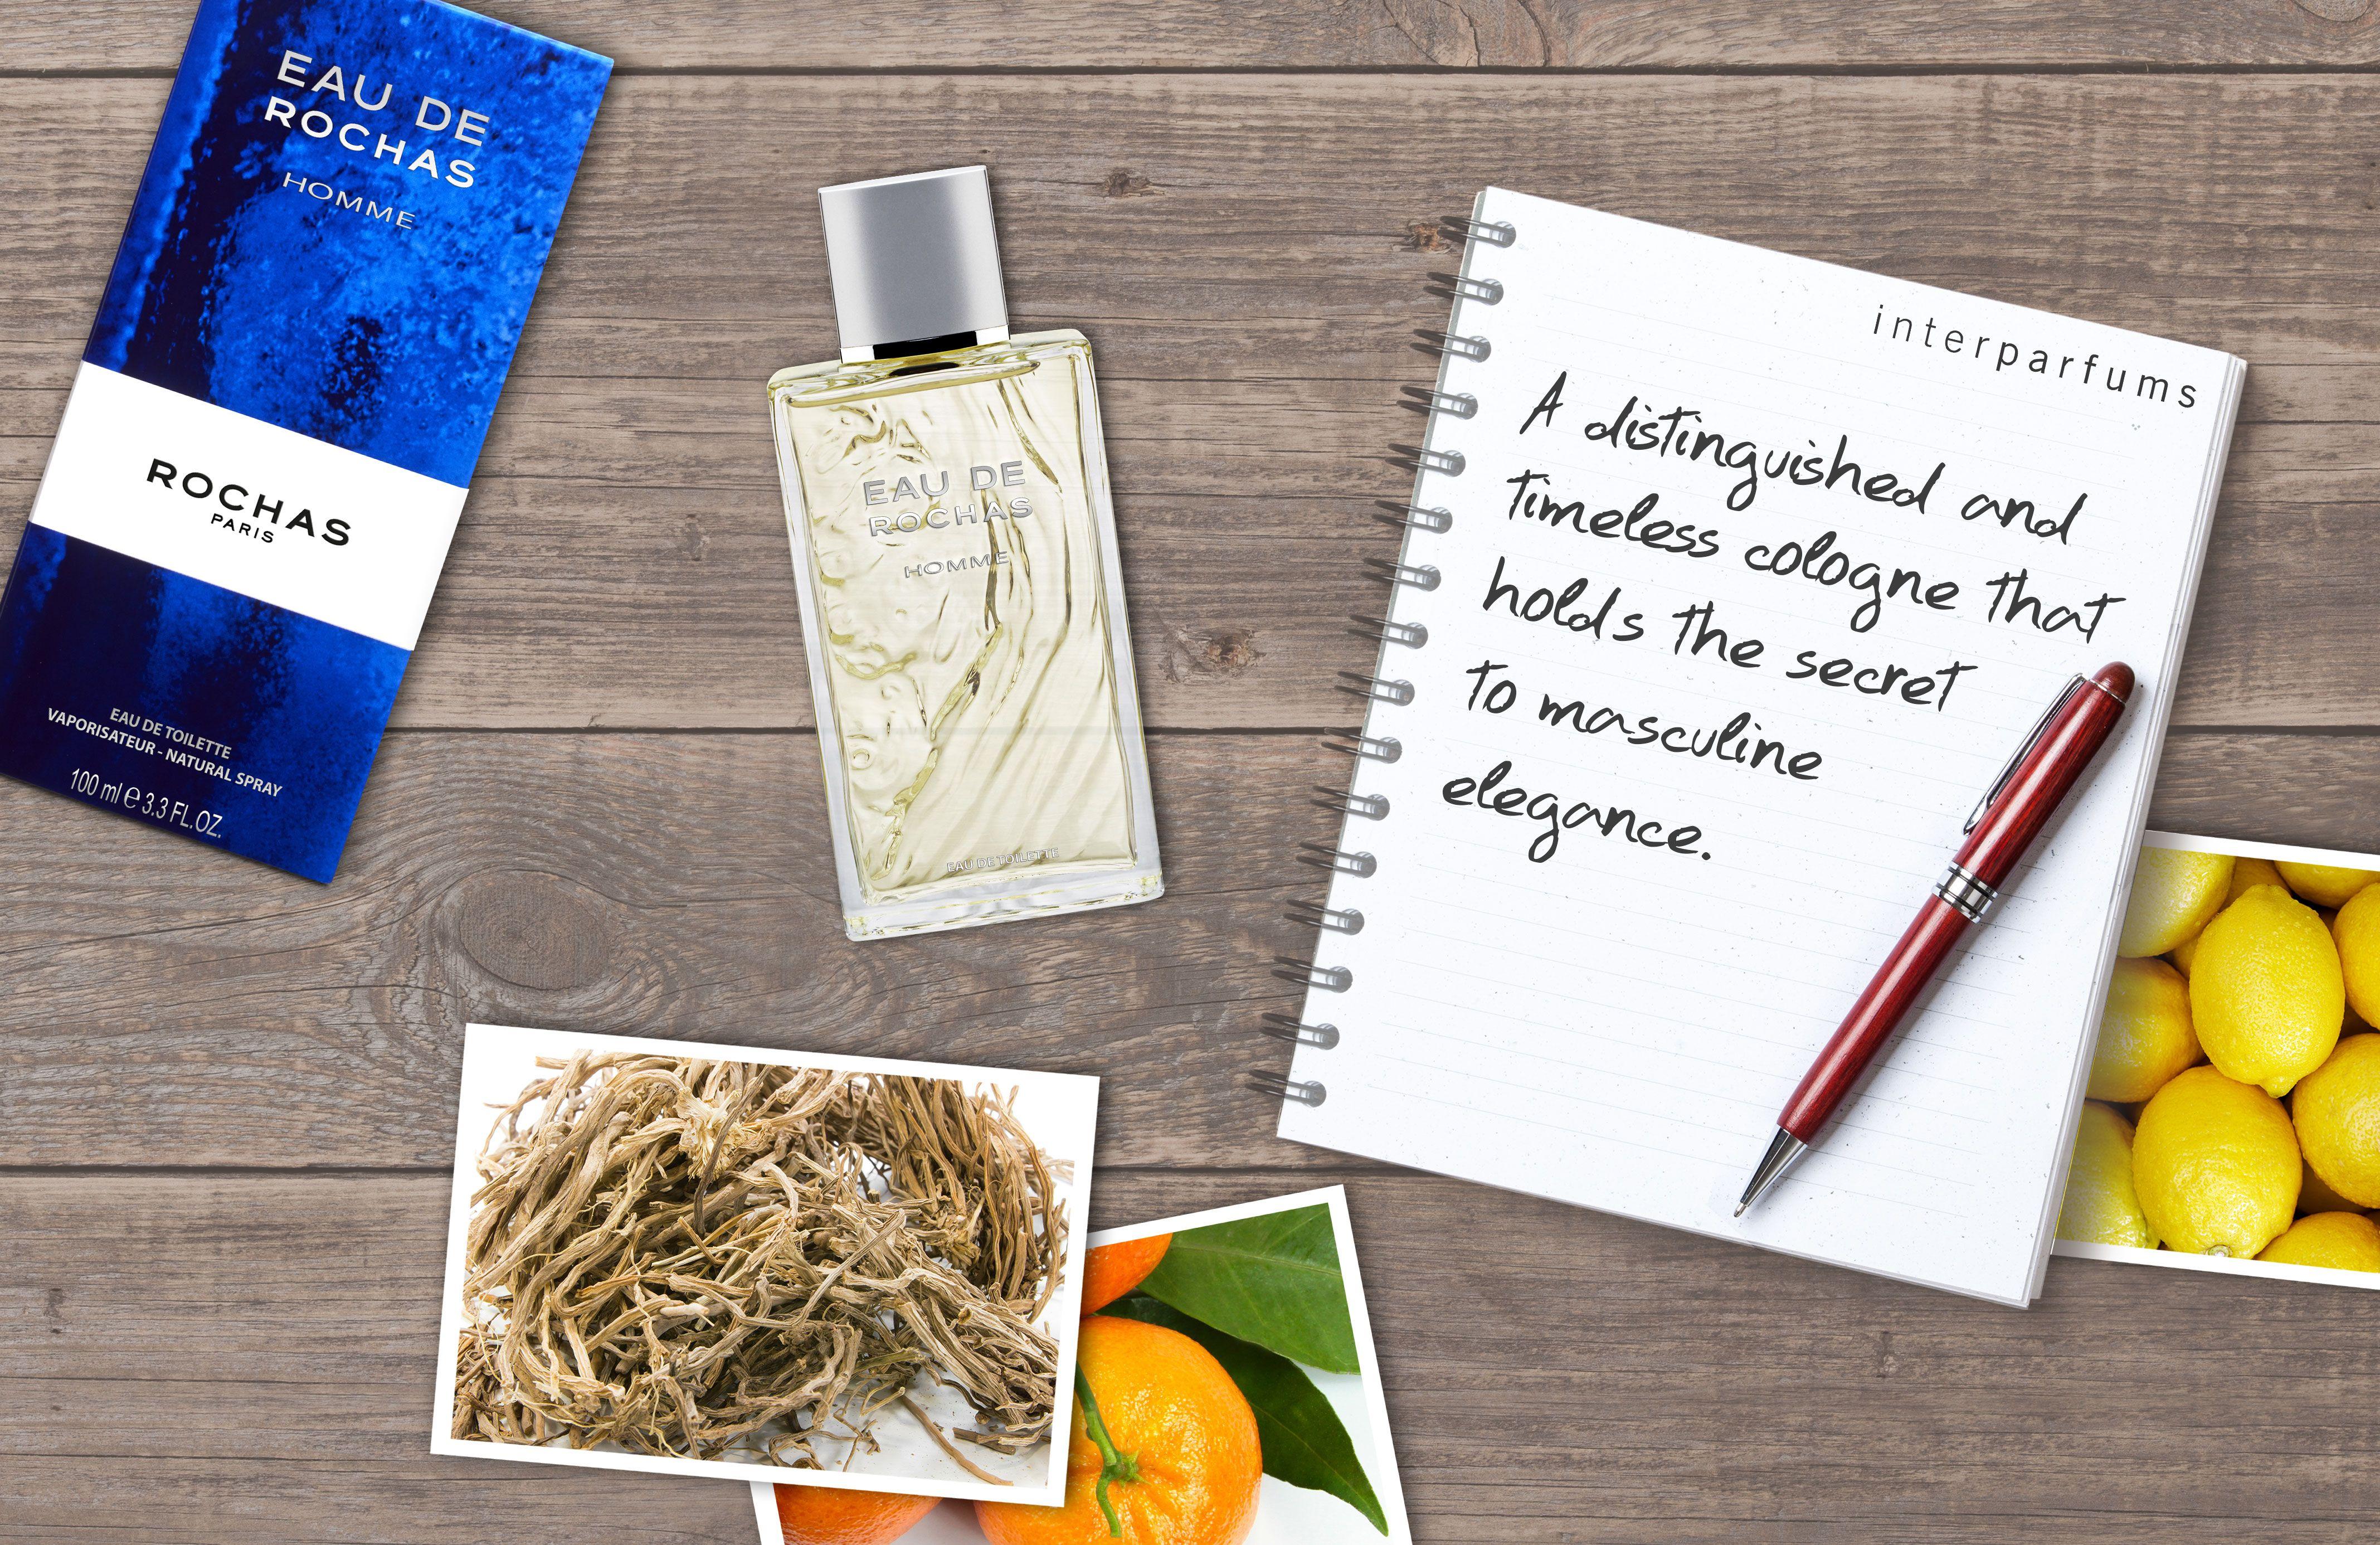 Eau de Rochas Homme, a fragrance for fathers' day #Rochas